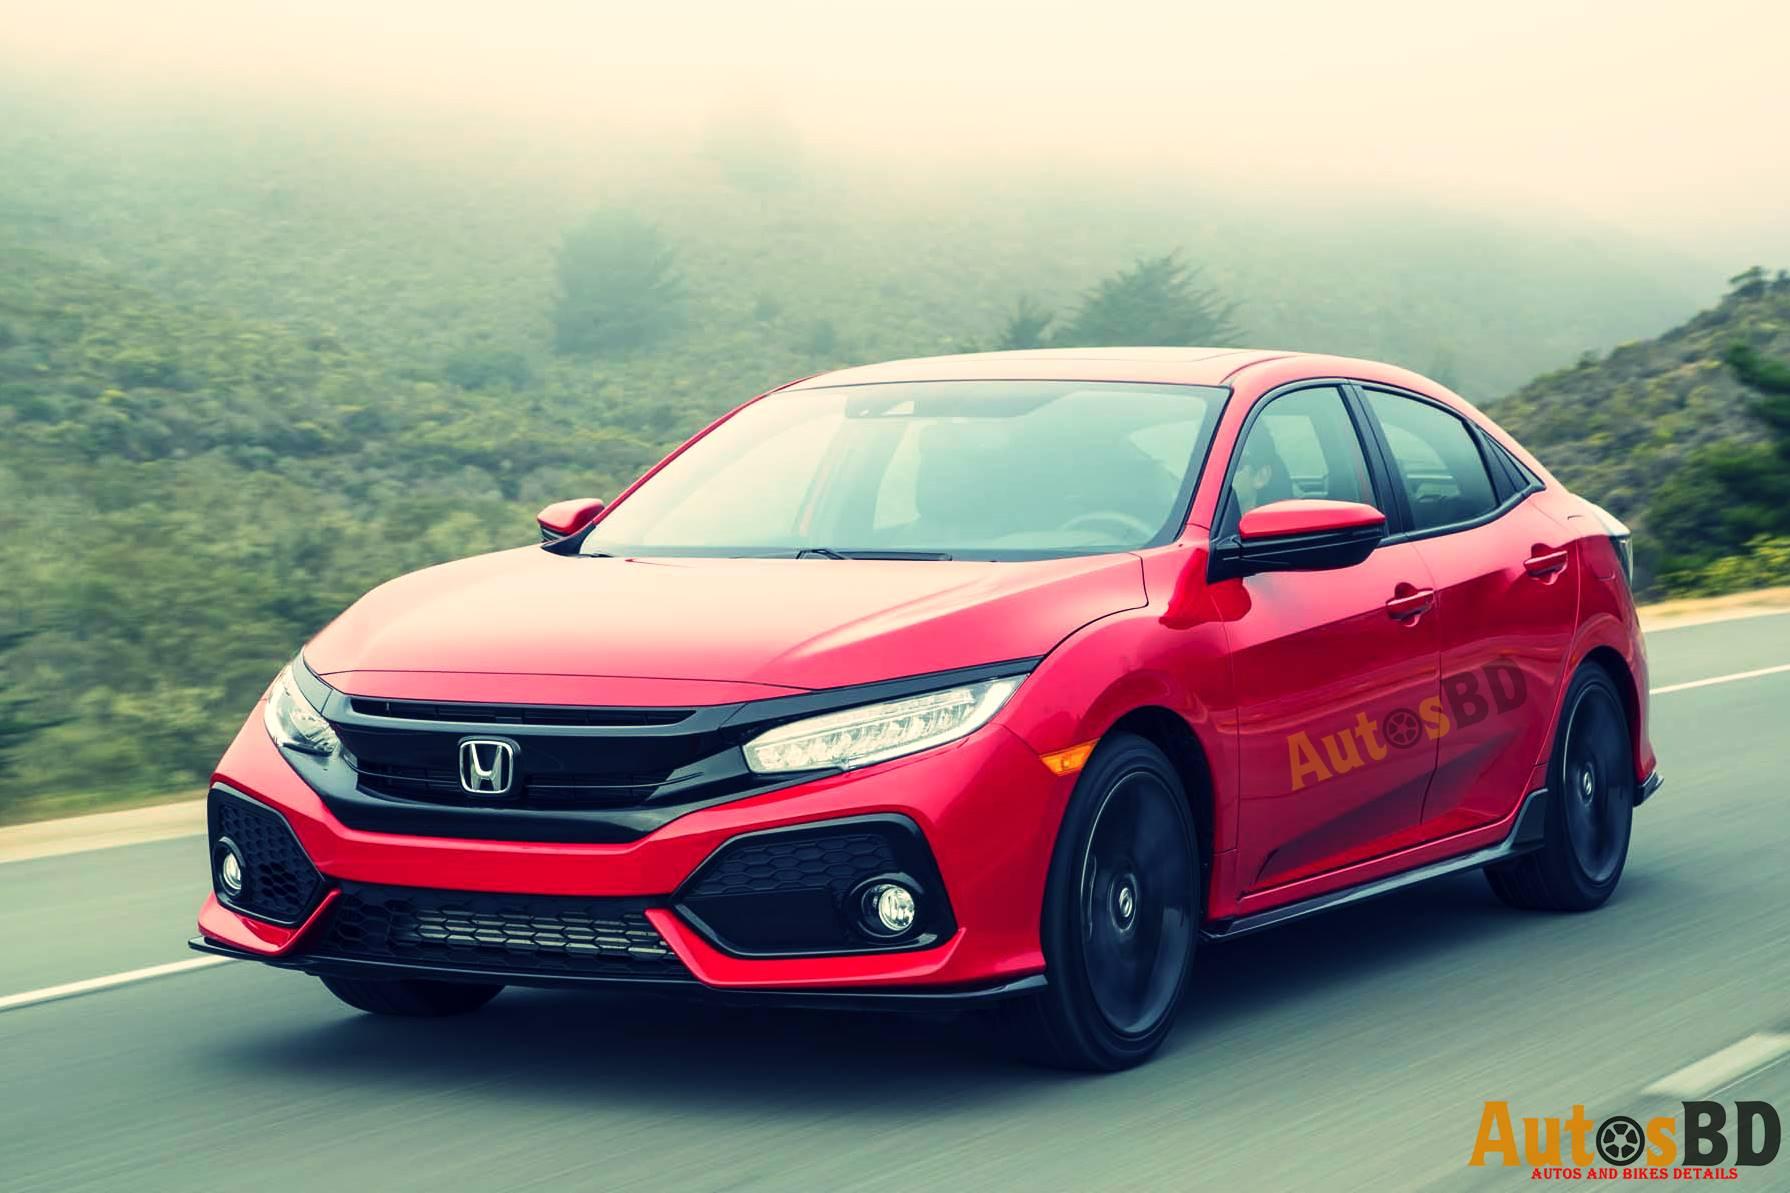 2017 Honda Civic Specification